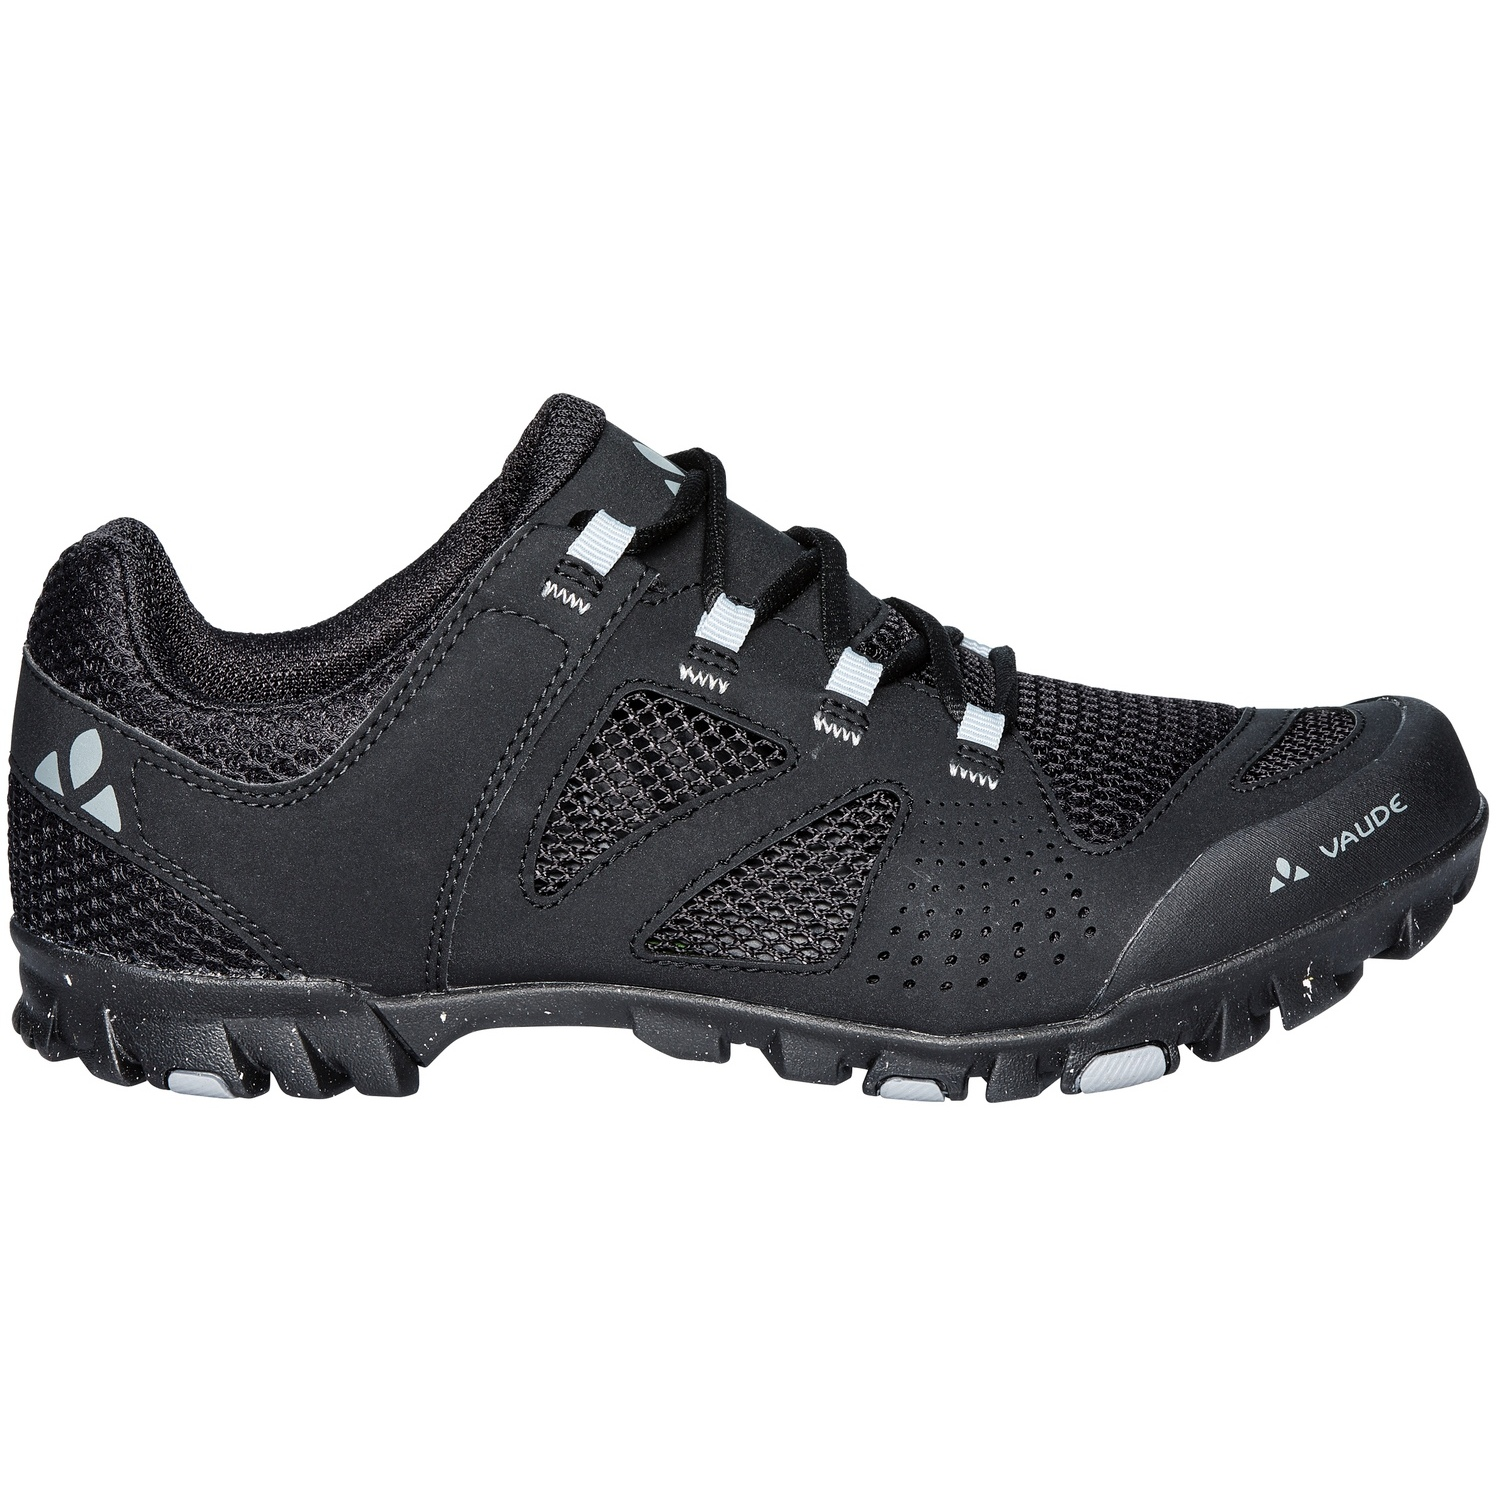 Vaude Men's TVL Hjul Ventilation Bike Shoes - black